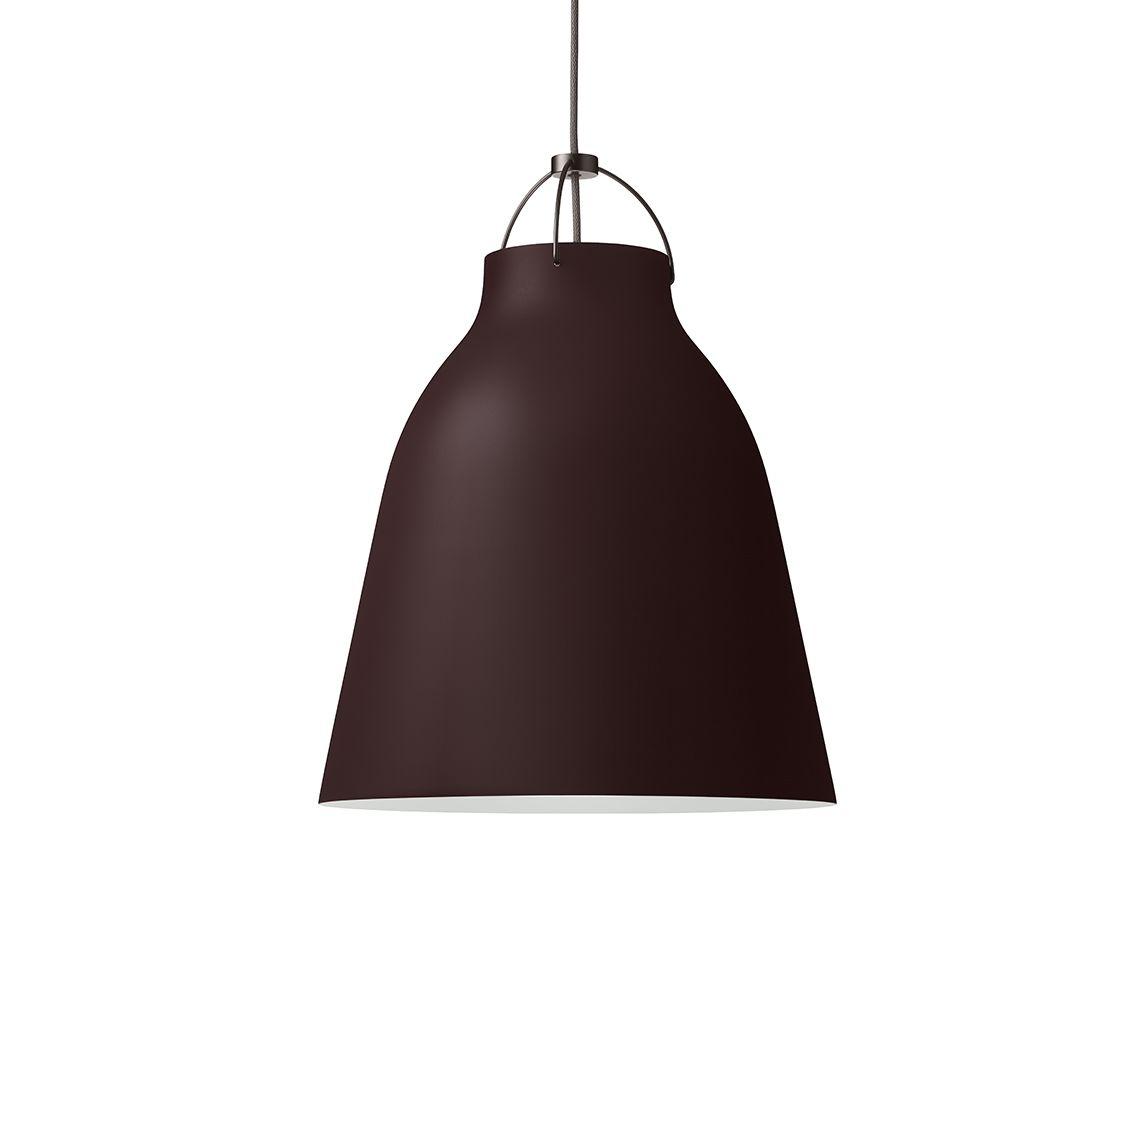 Caravaggio hanglamp Lightyears Ø16 Dark Sienna